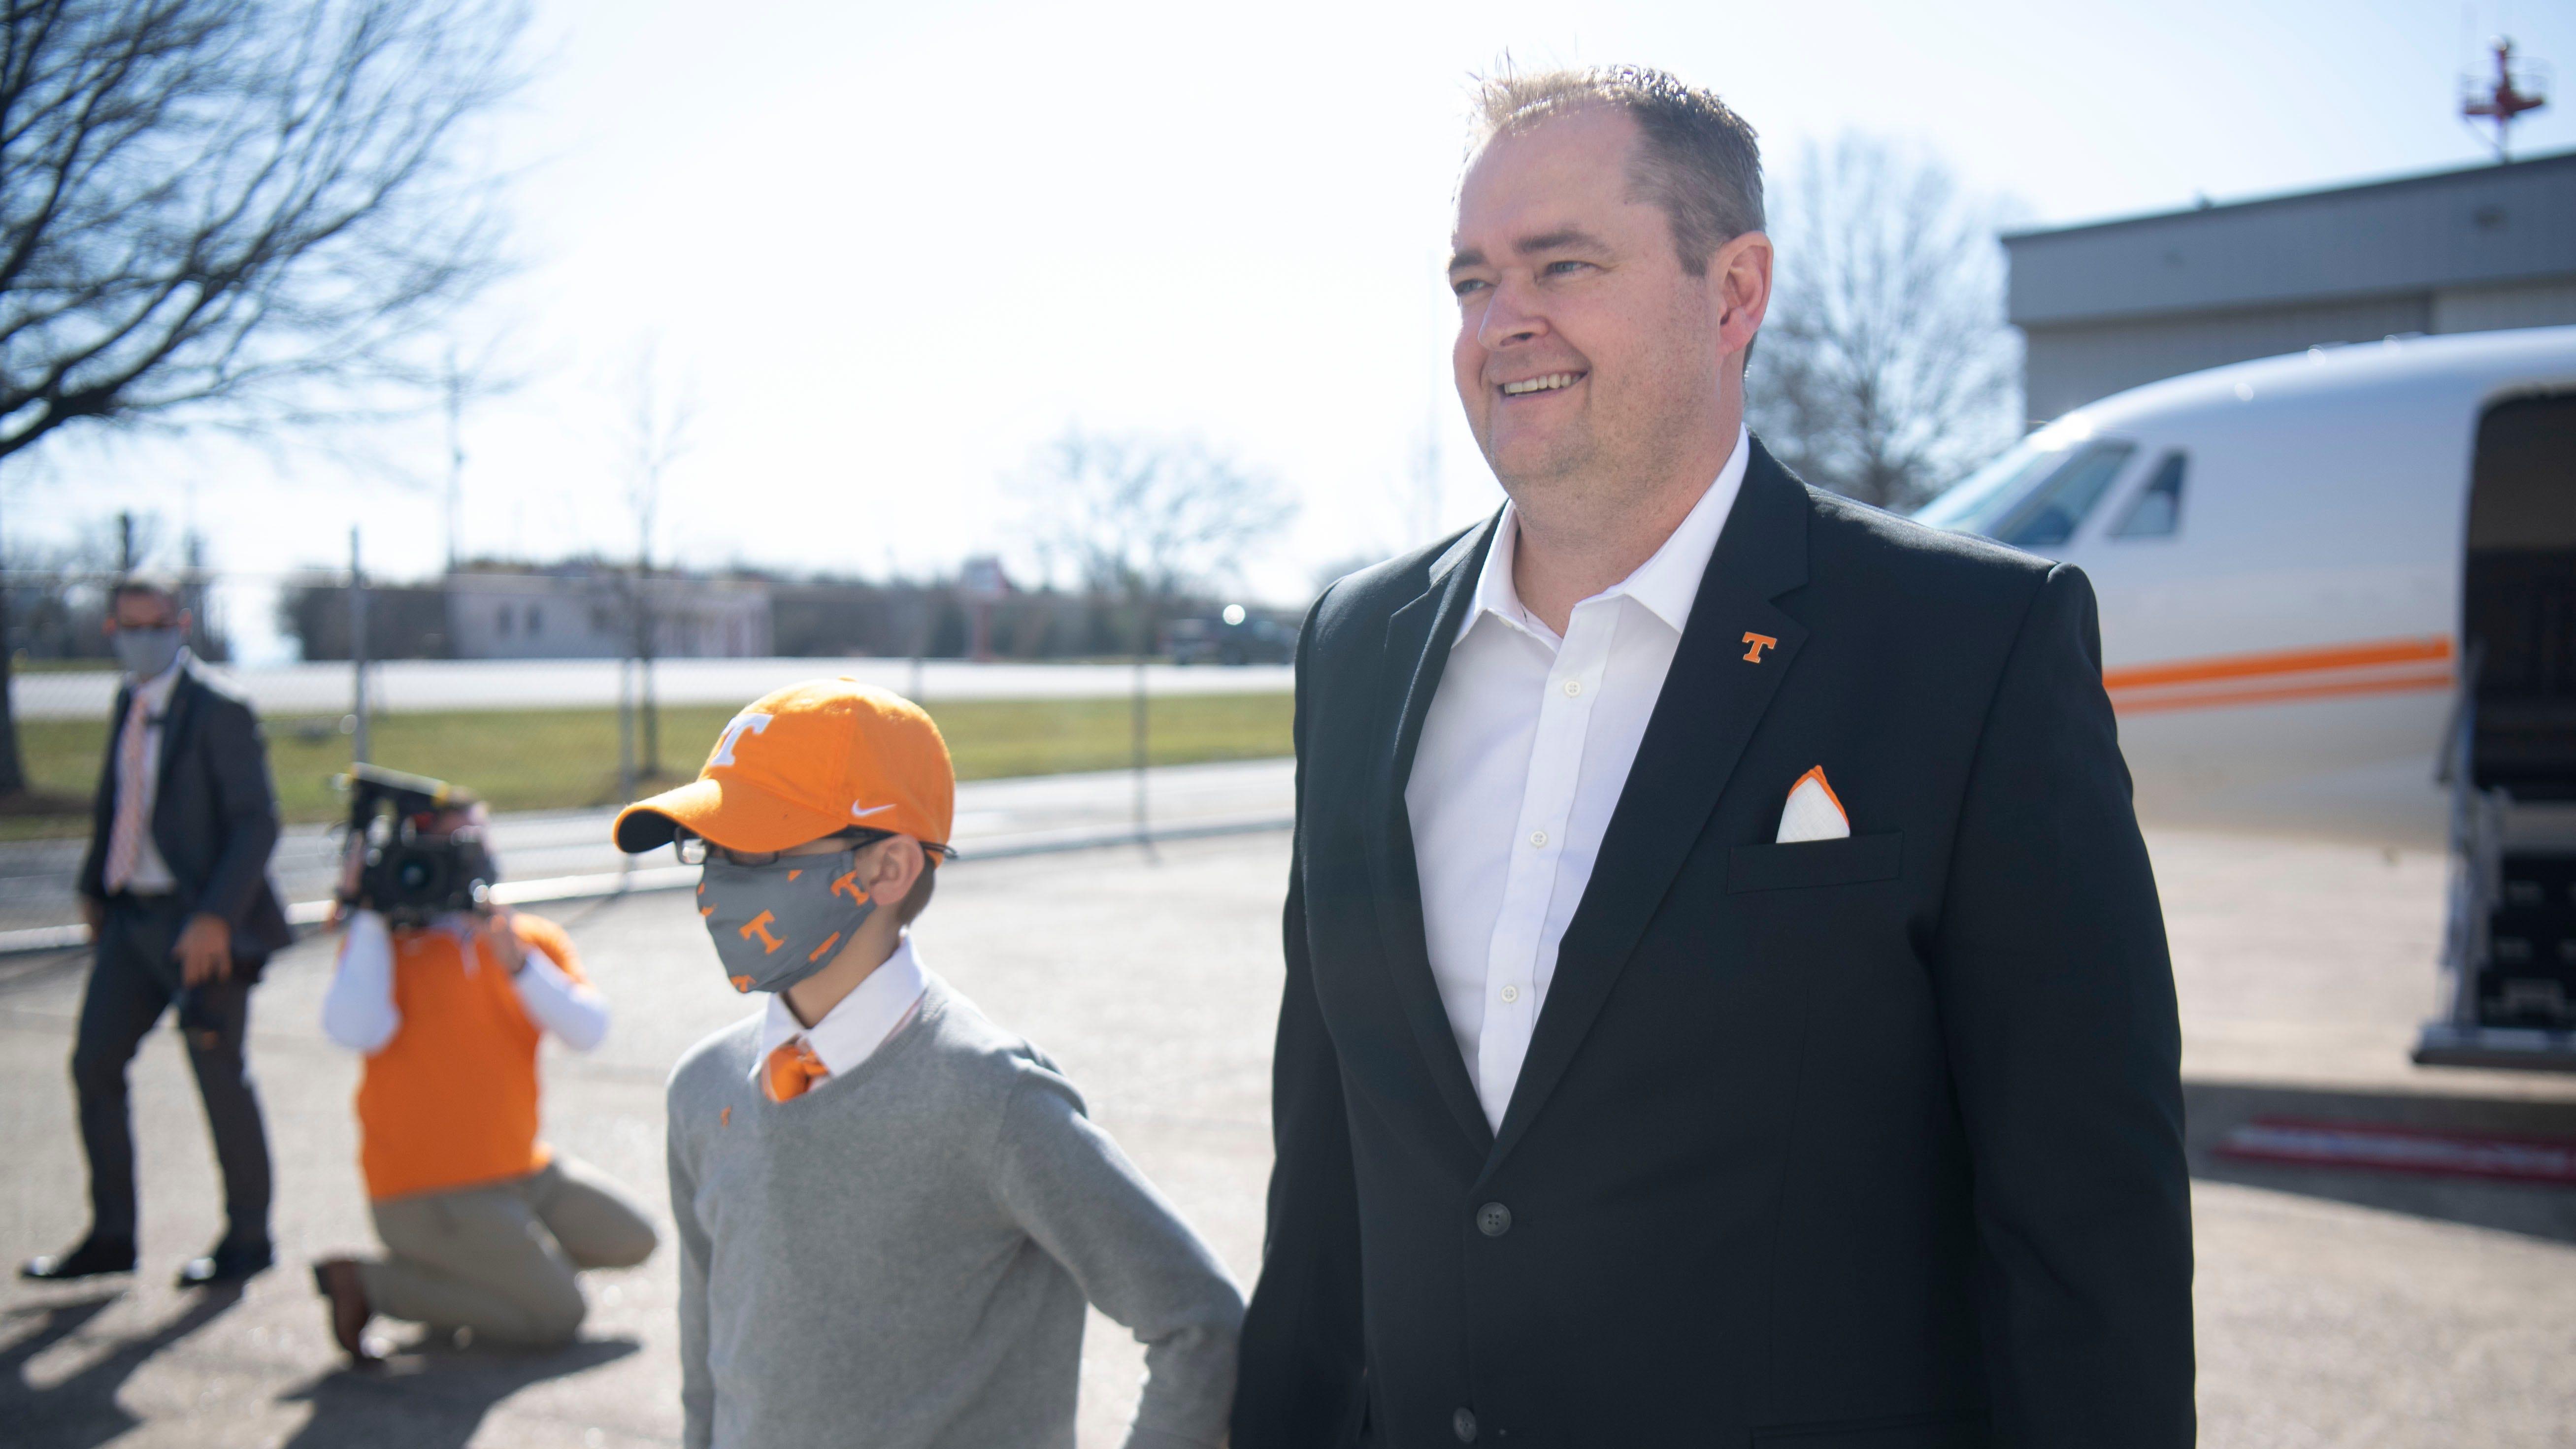 Adams: Josh Heupel shapes up as anti-Pruitt